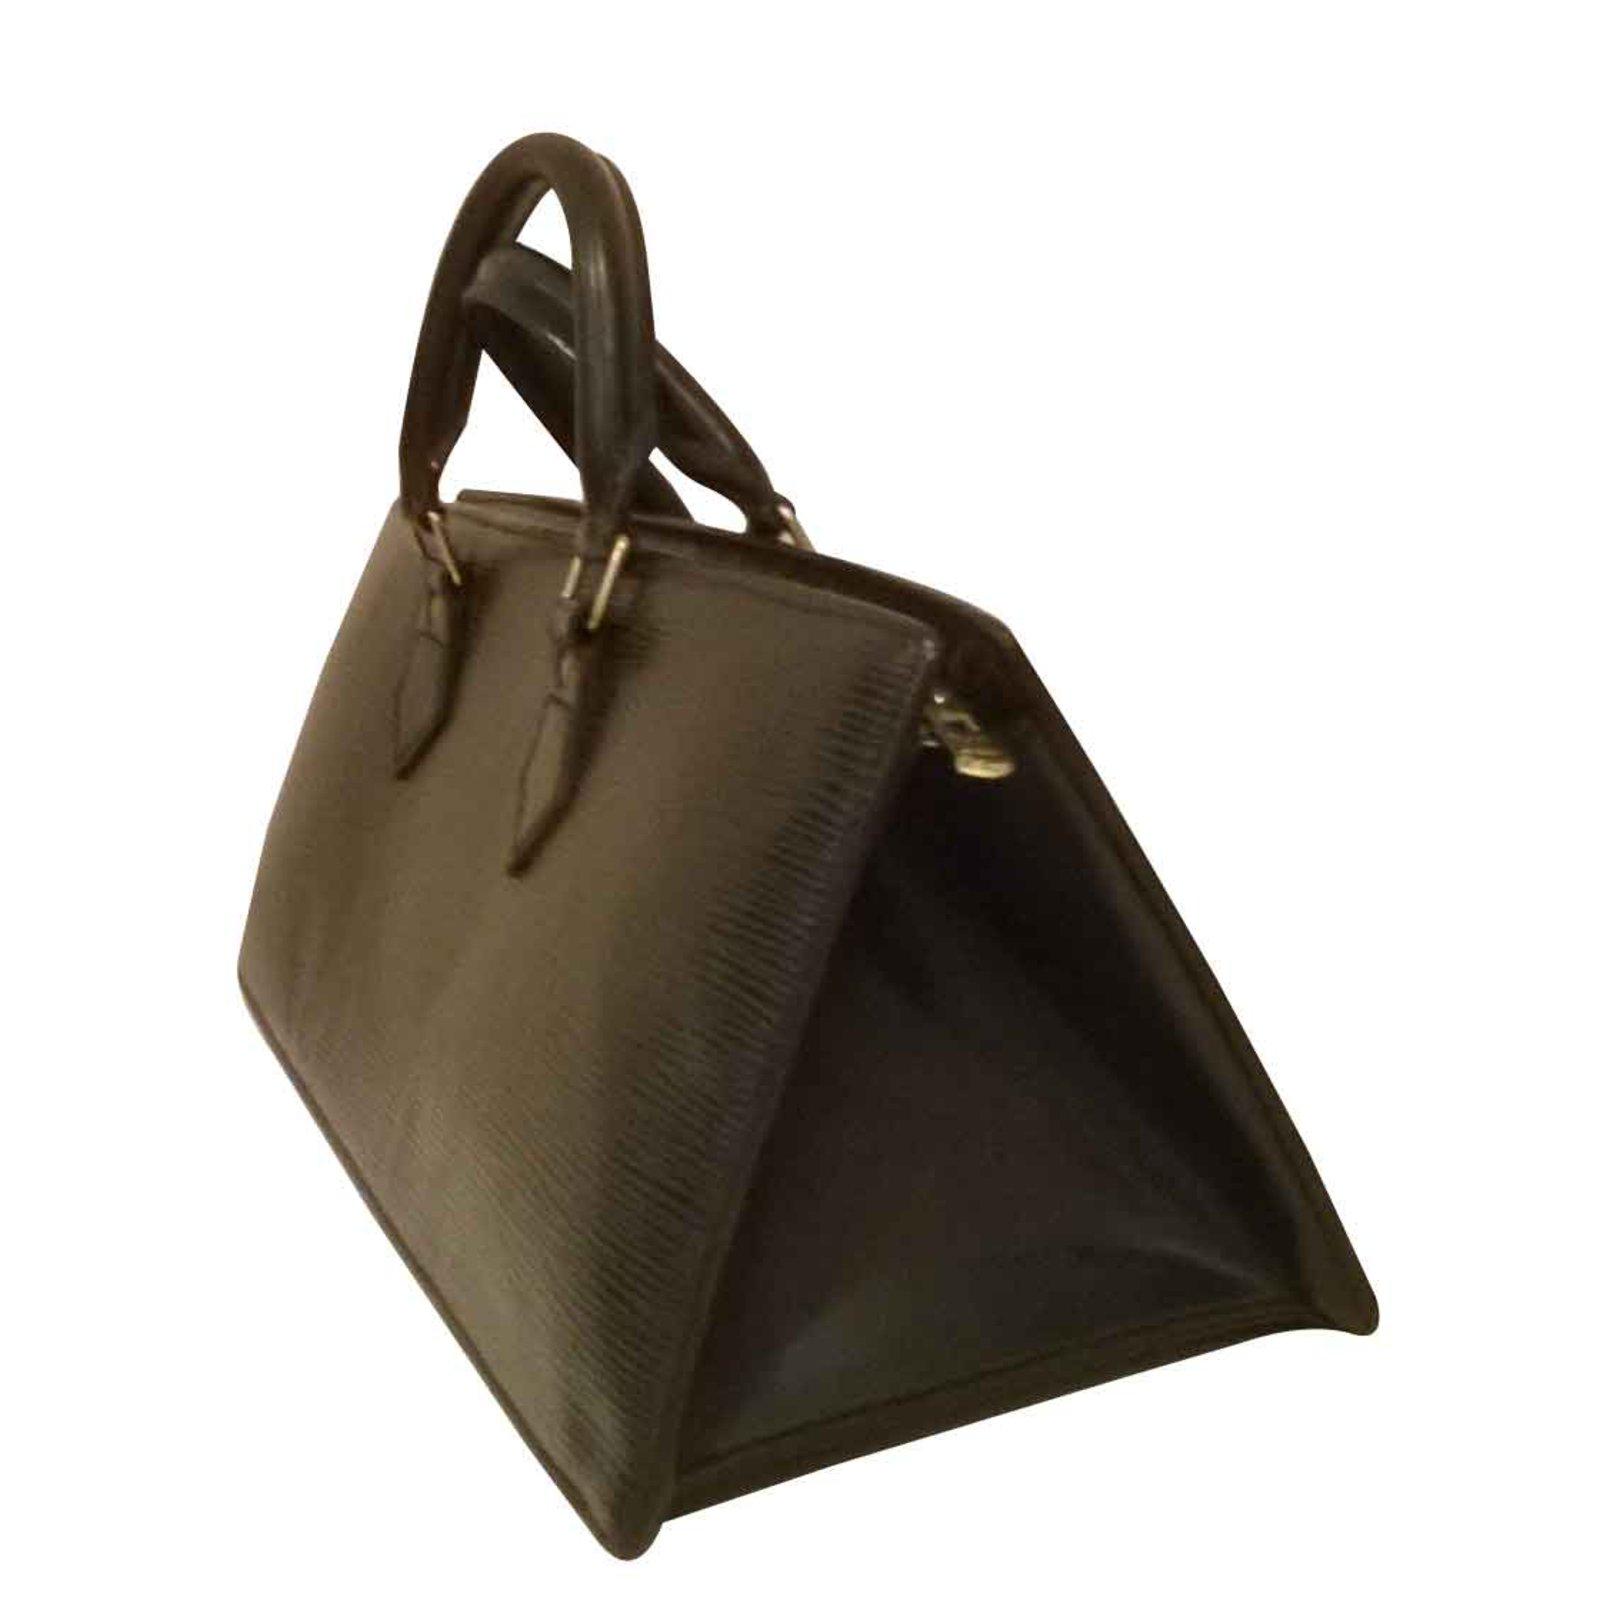 4da0e425701b Louis Vuitton handbag Handbags Leather Black ref.102999 - Joli Closet